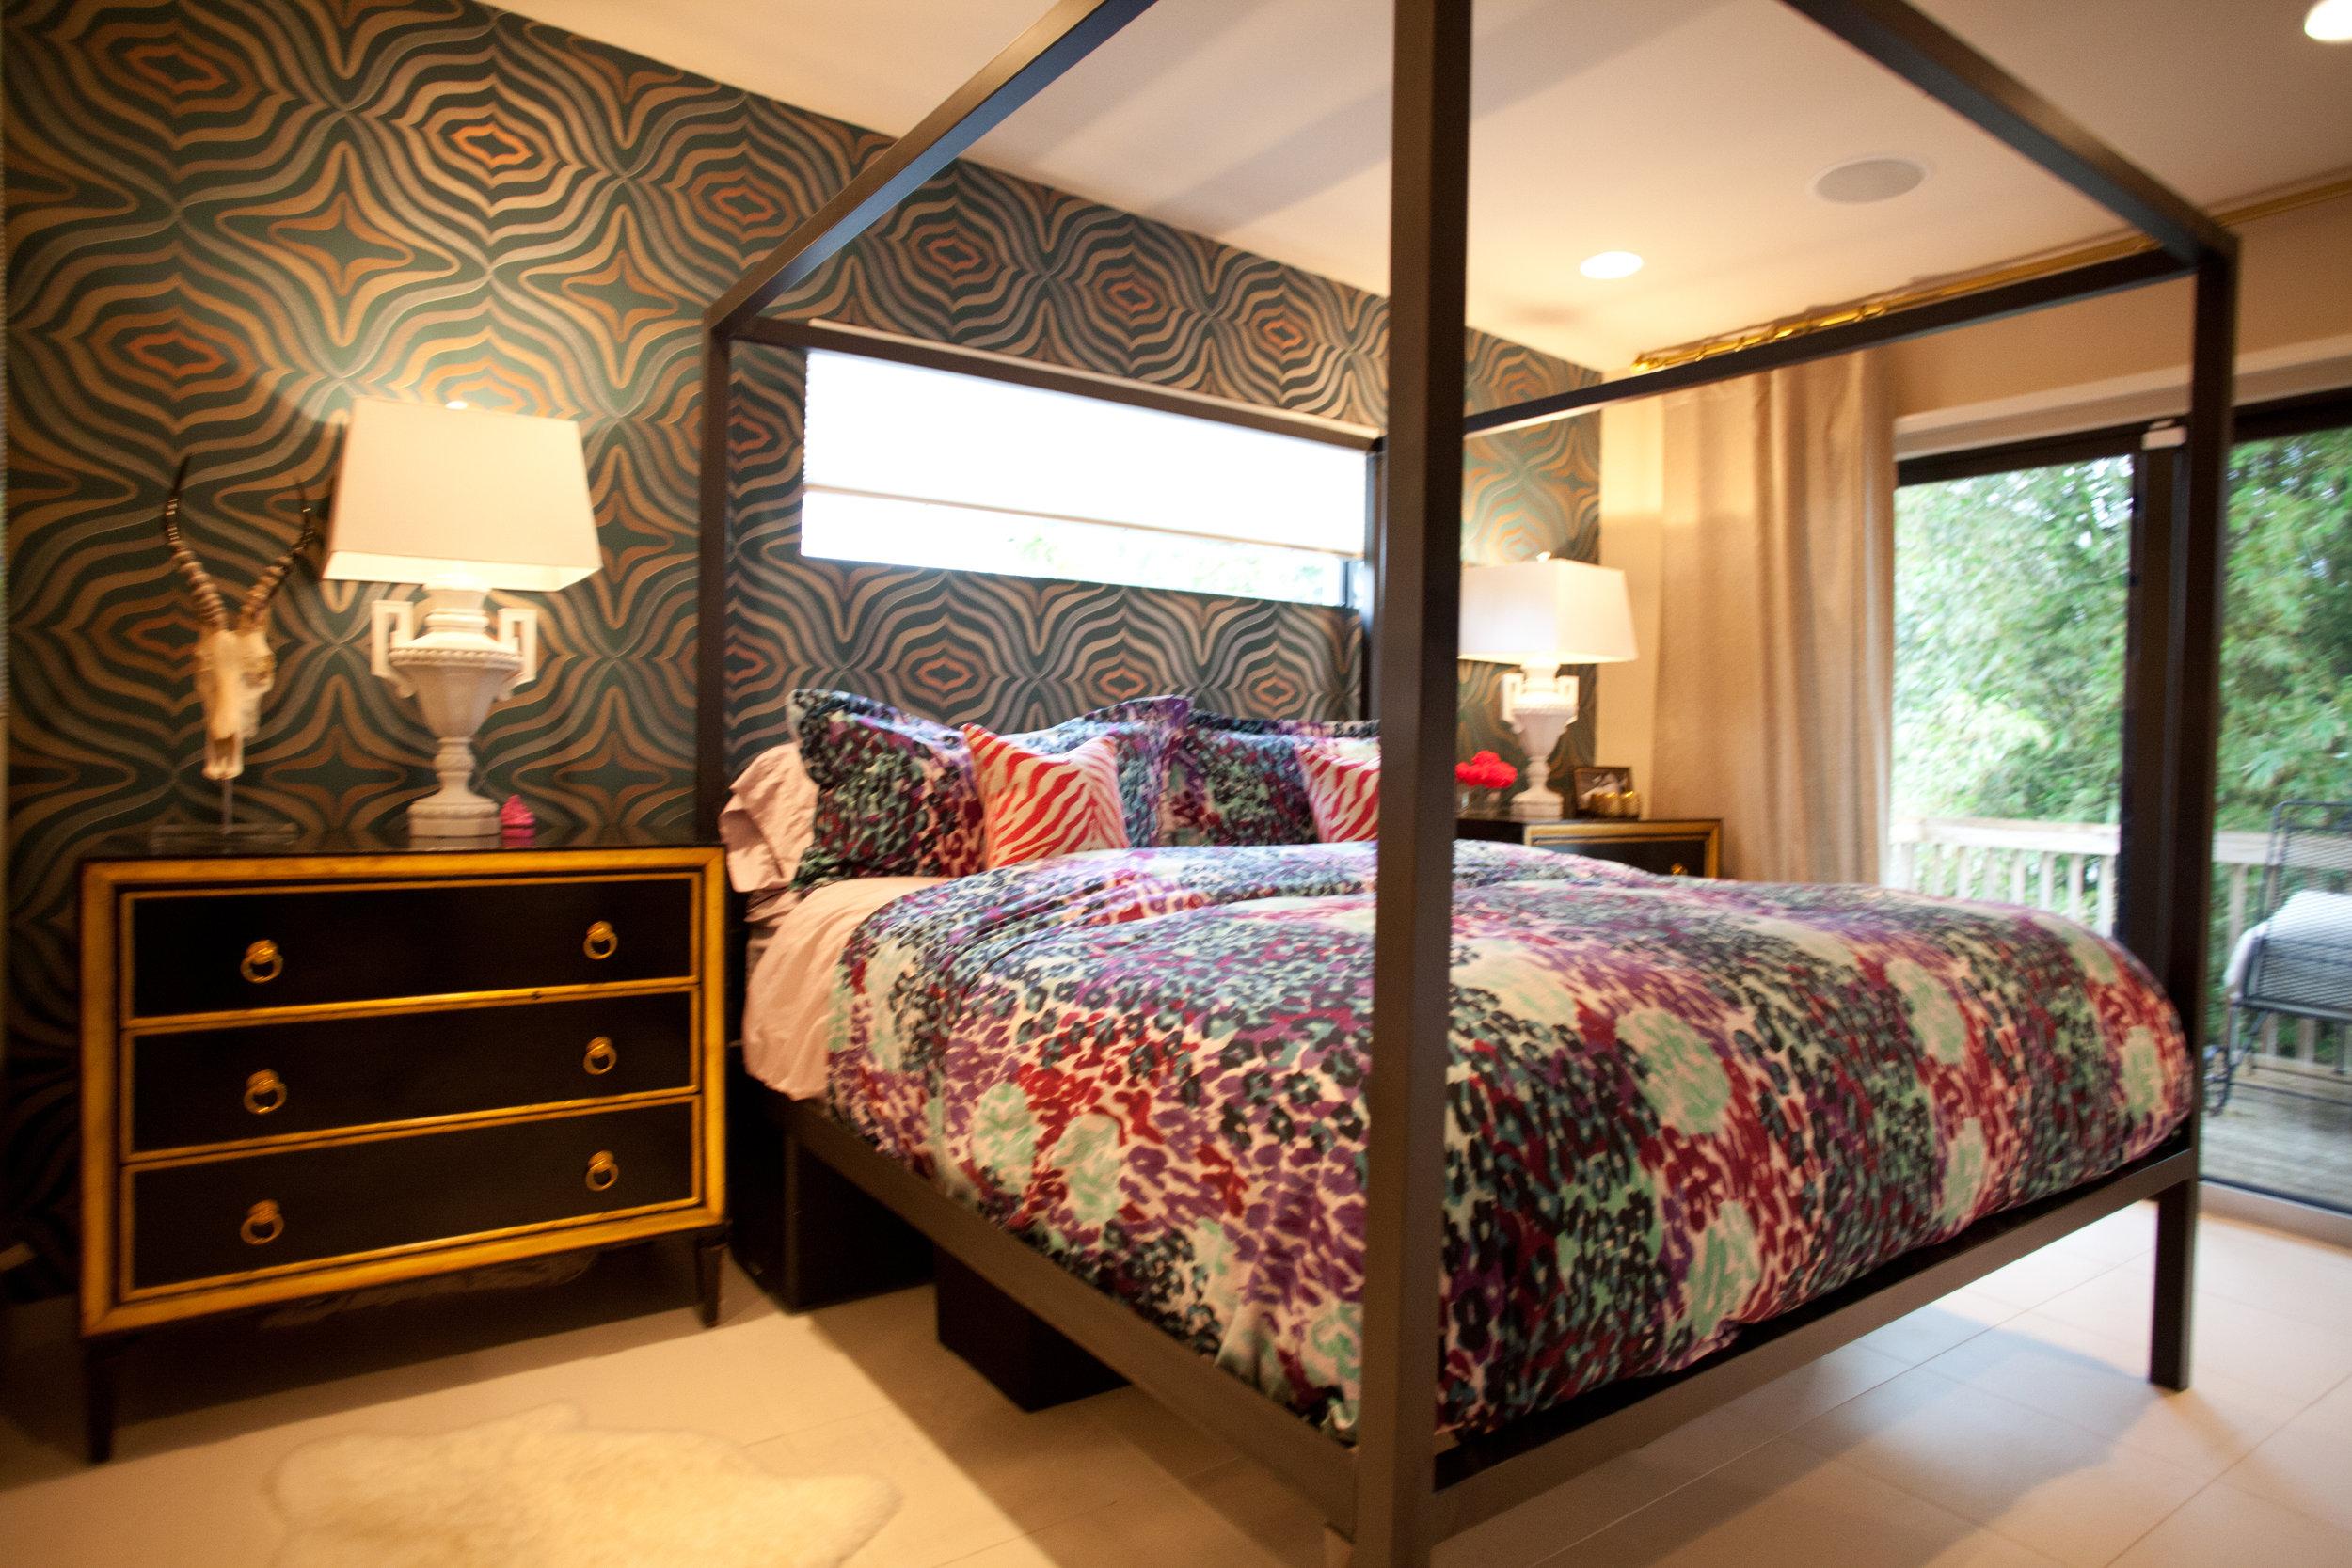 Marconi_master bedroom.jpg